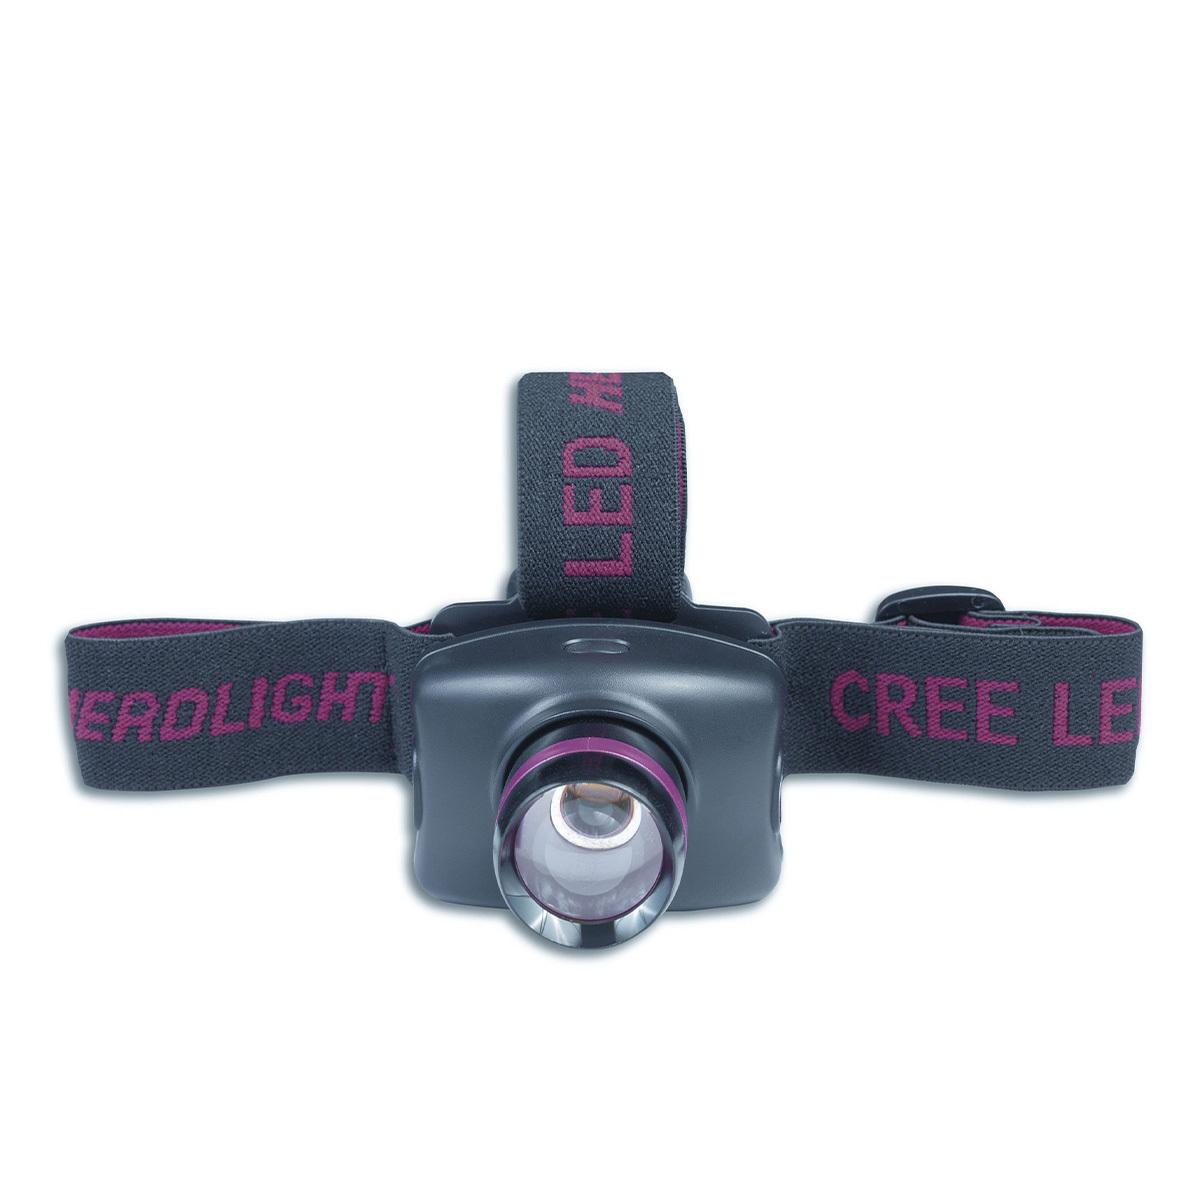 43-2032-led-stirnlampe-lumatic-head-super-focus-1200x1200px.jpg